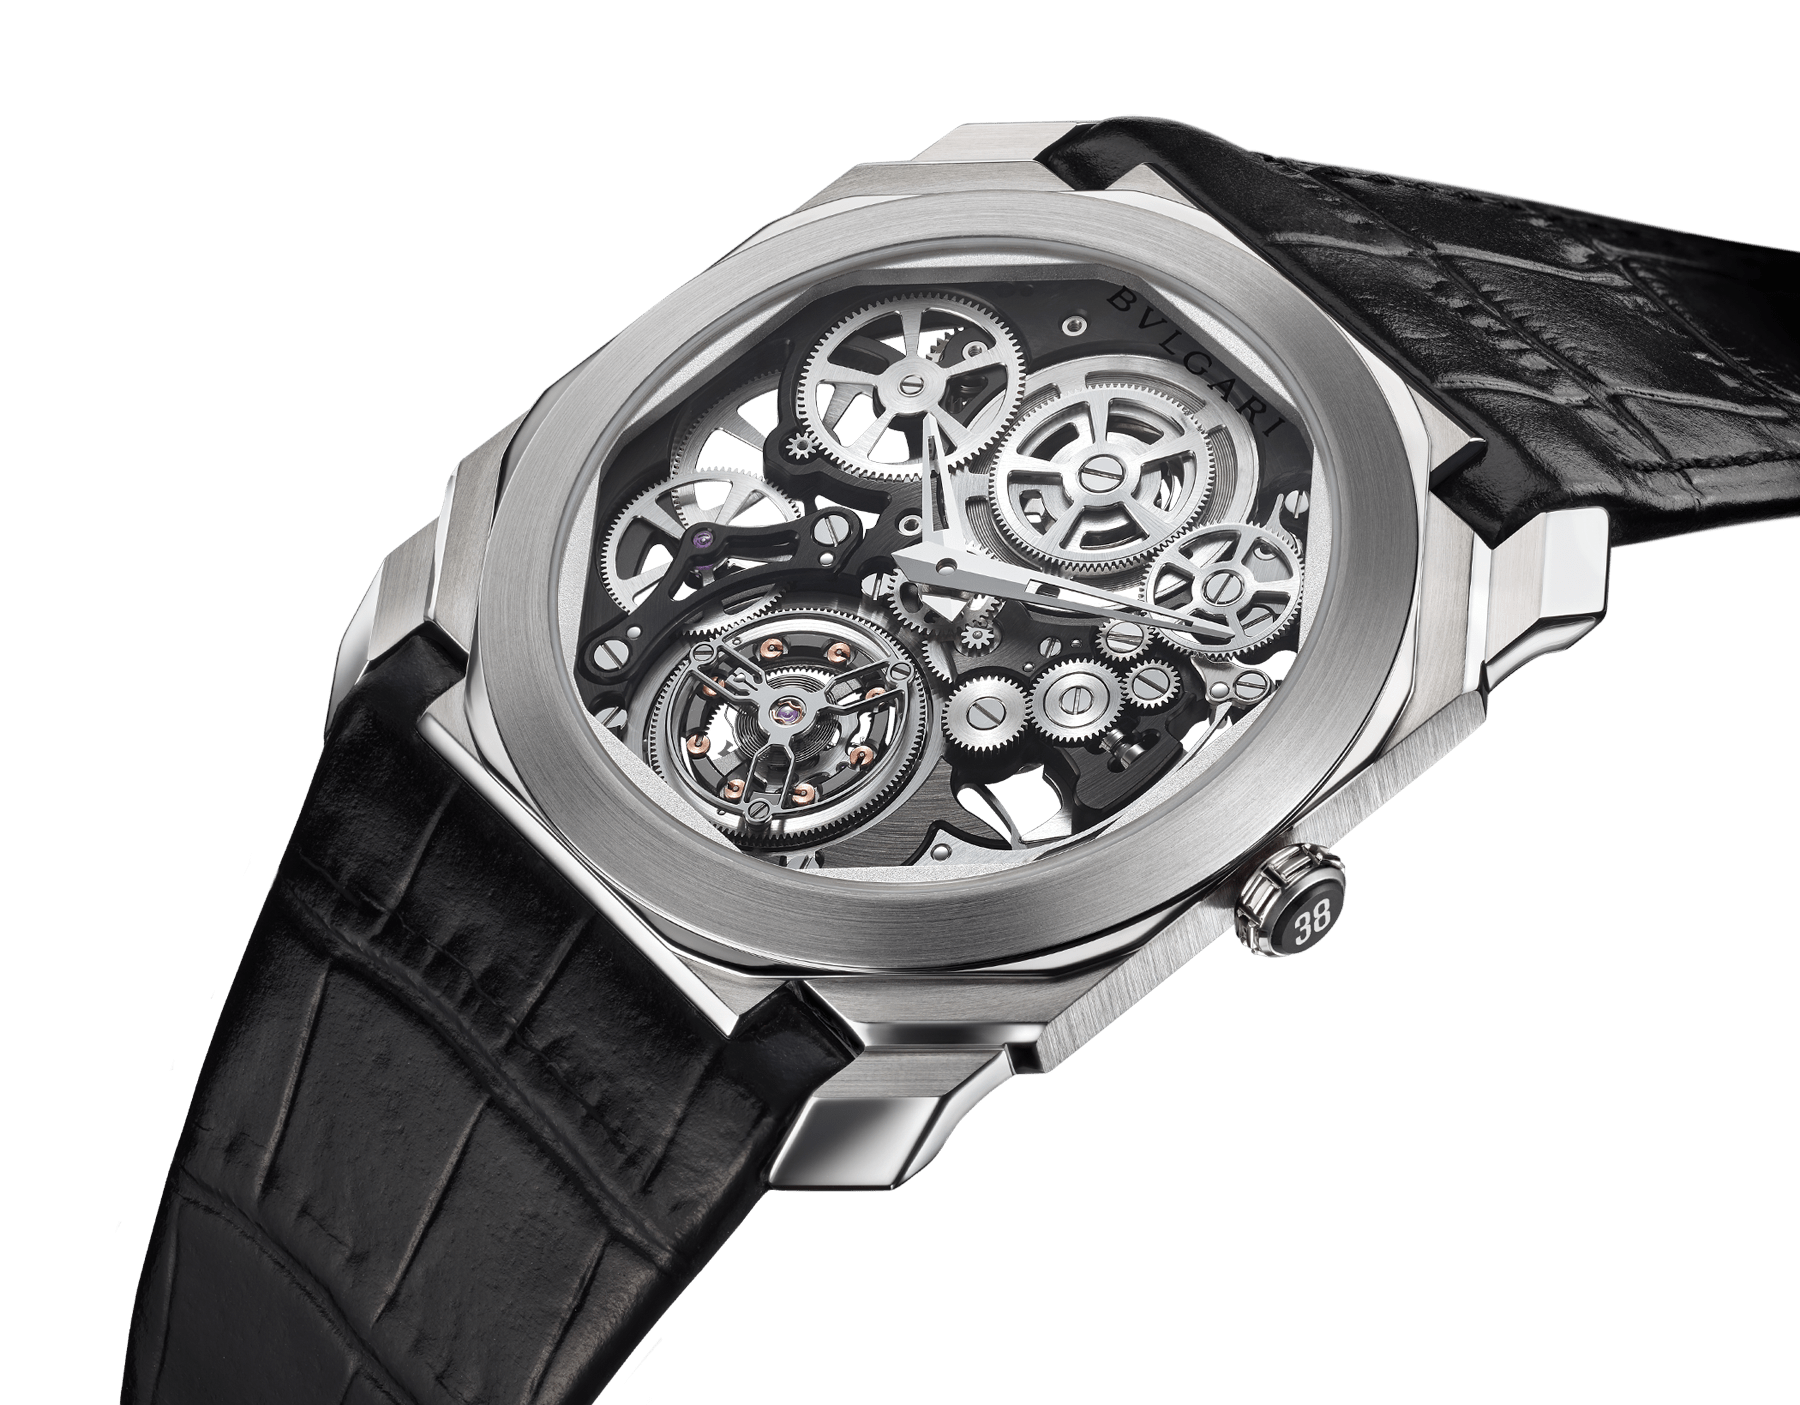 Octo Finissimo Tourbillon Squelette 腕錶搭載超薄鏤空機械機芯,手動上鍊,滾珠軸承系統,鉑金錶殼,透明錶盤,黑色鱷魚皮錶帶。 102719 image 2